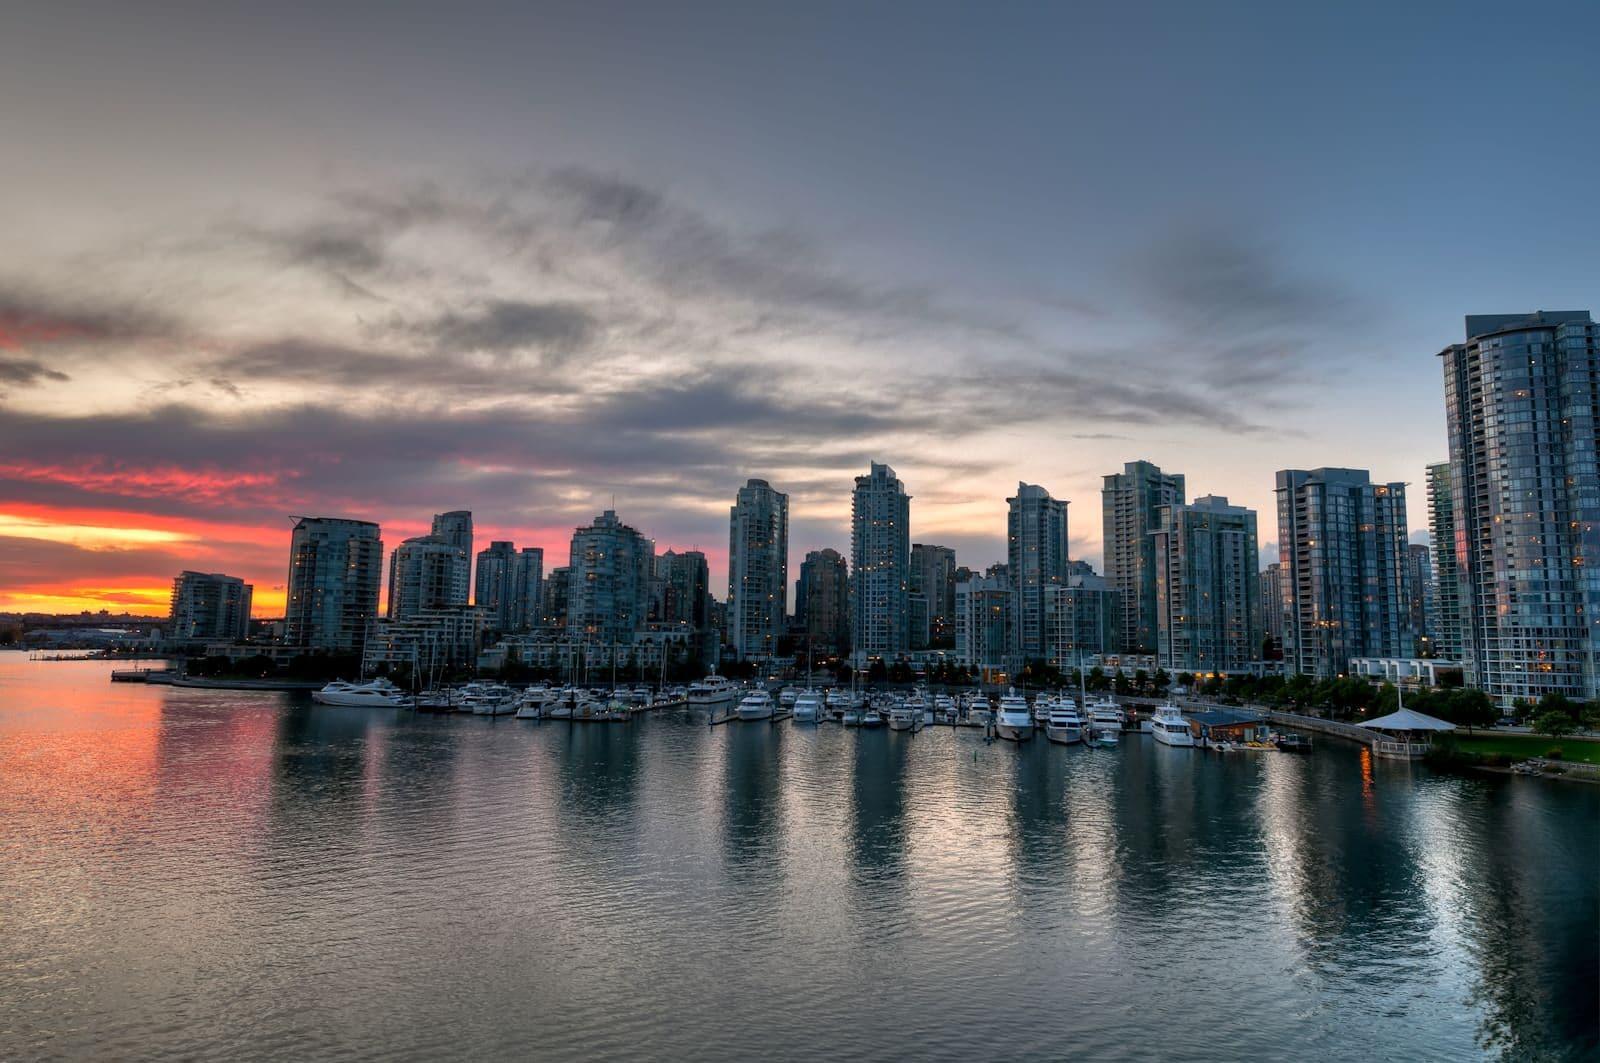 Boston Hd Wallpaper Vancouver Skyline At Sunset